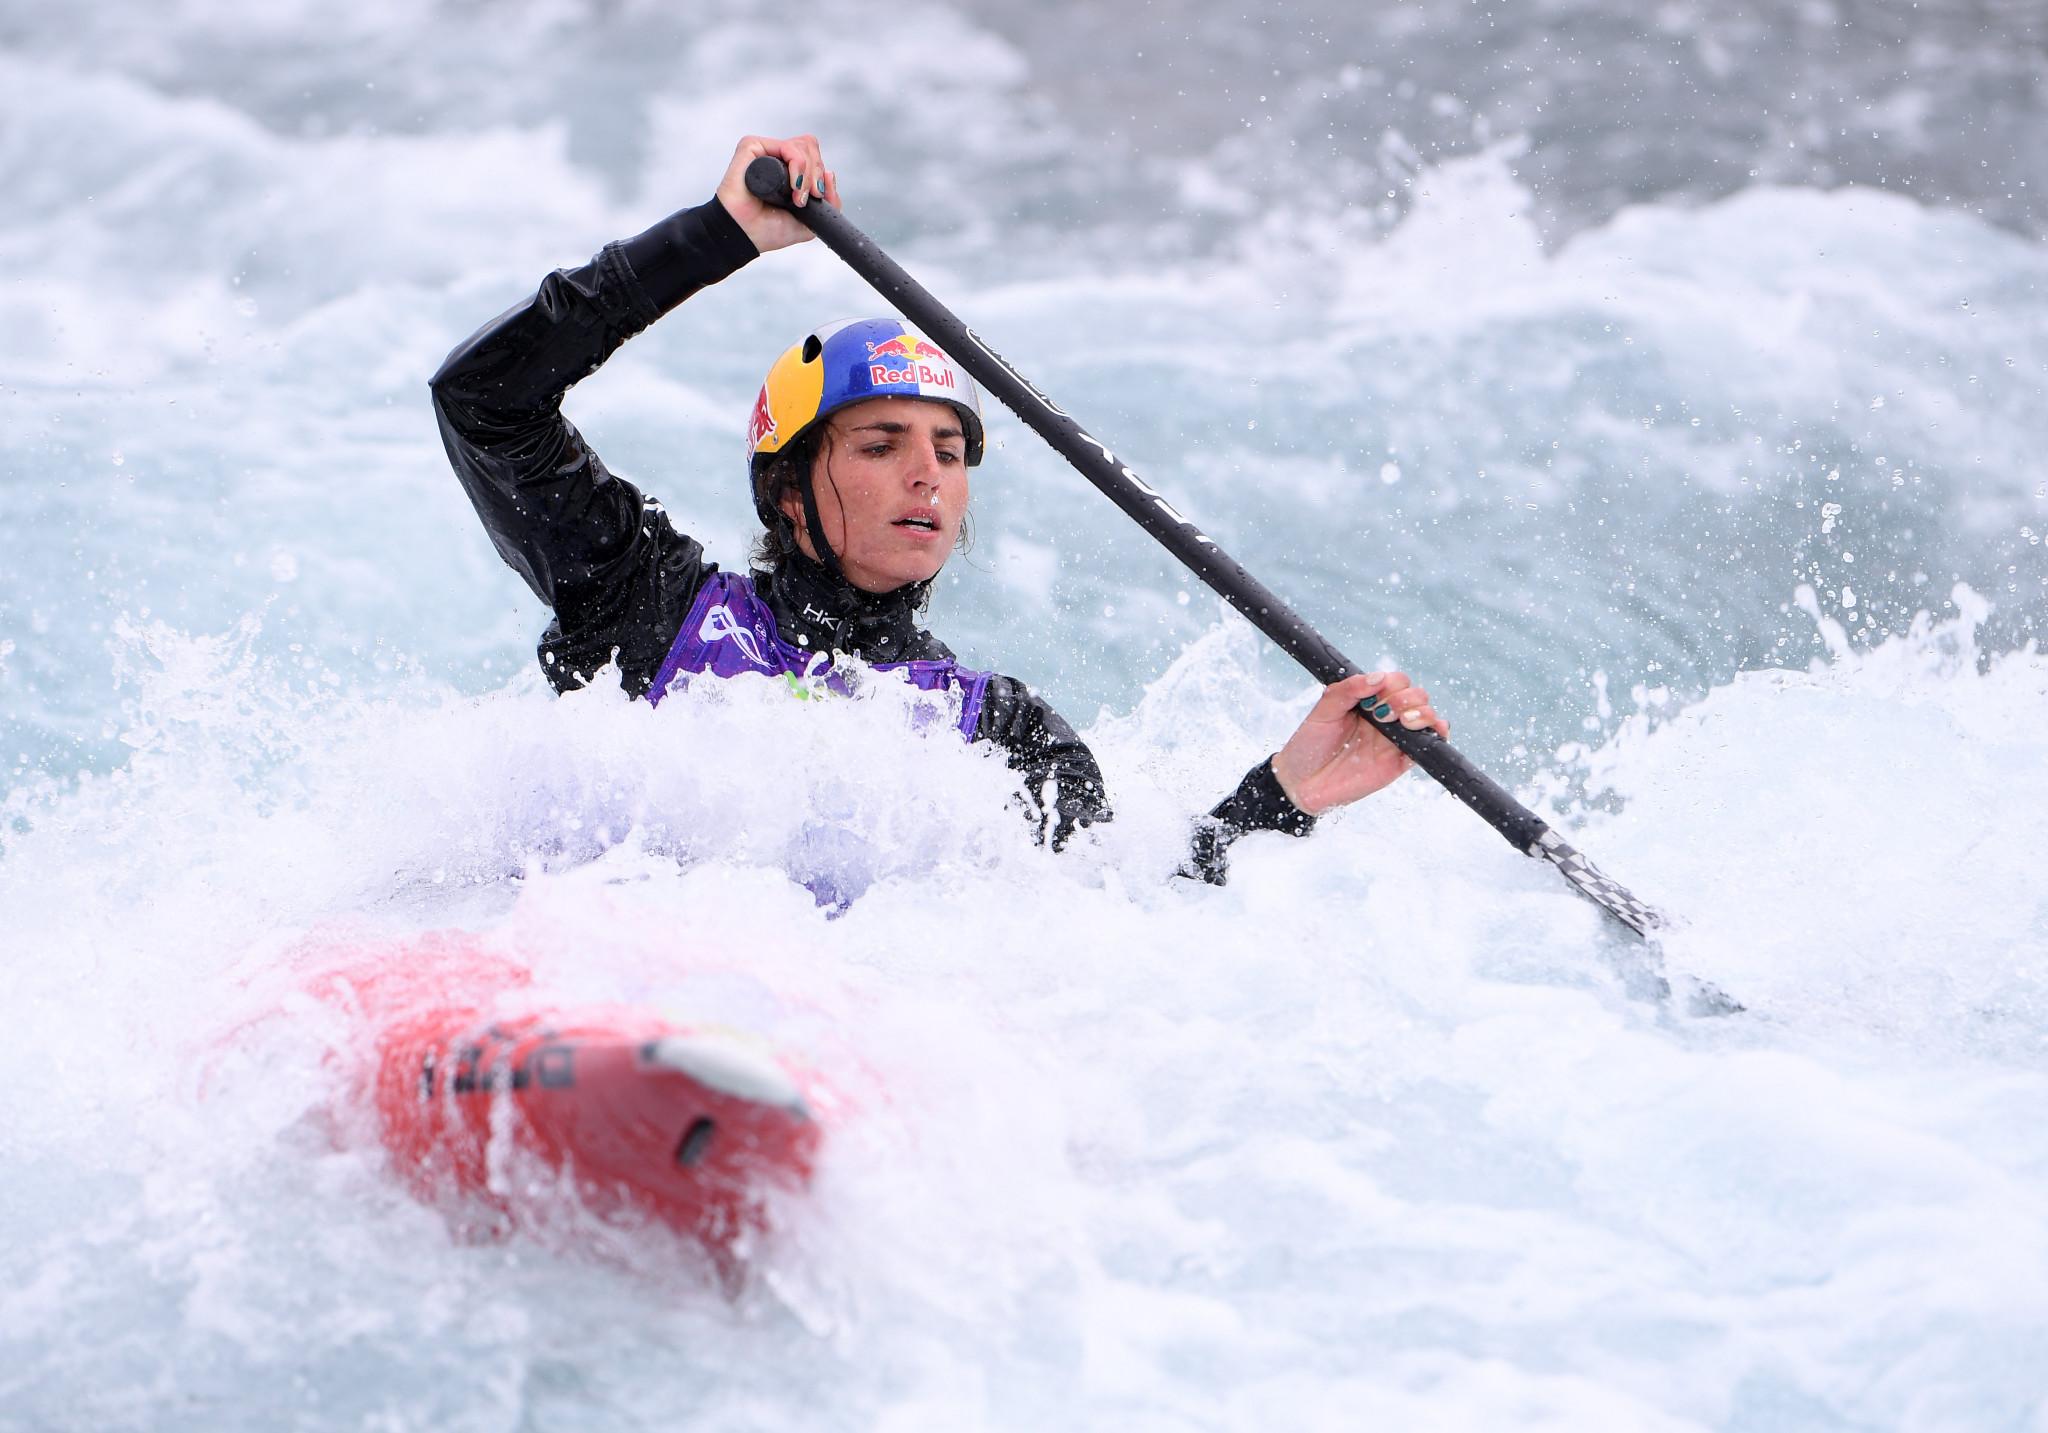 Australian Olympic canoe slalom team return with victories following COVID-19 break